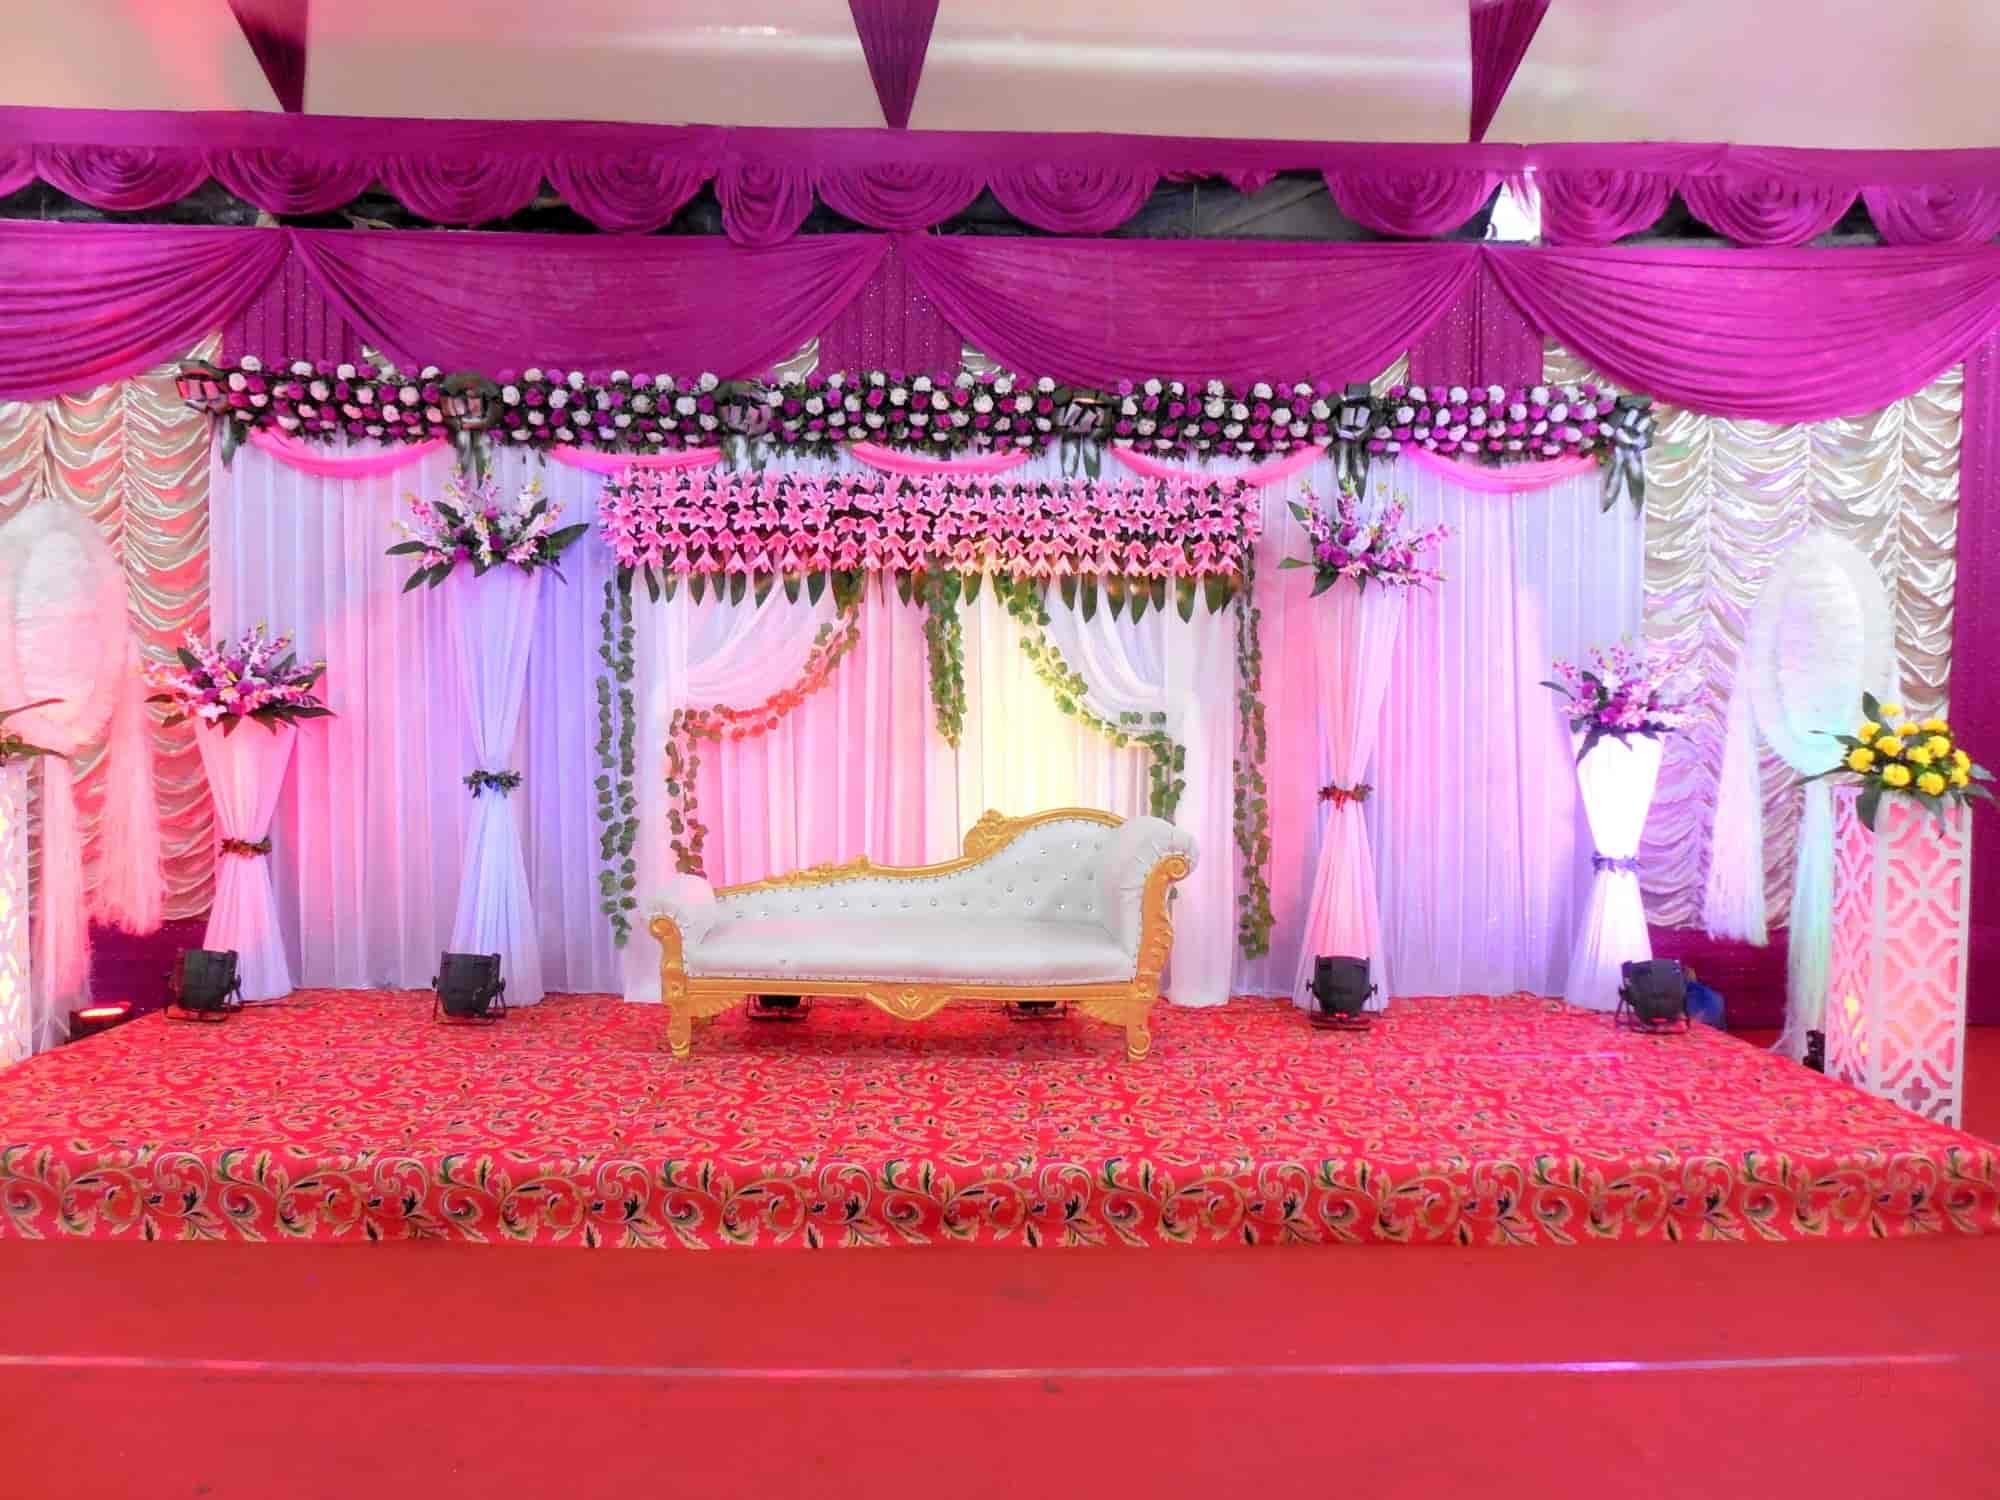 Urvashi dreams weddings event unit dispur urvashi dreamz urvashi dreams weddings event unit dispur urvashi dreamz weddings event unit caterers in guwahati justdial junglespirit Choice Image